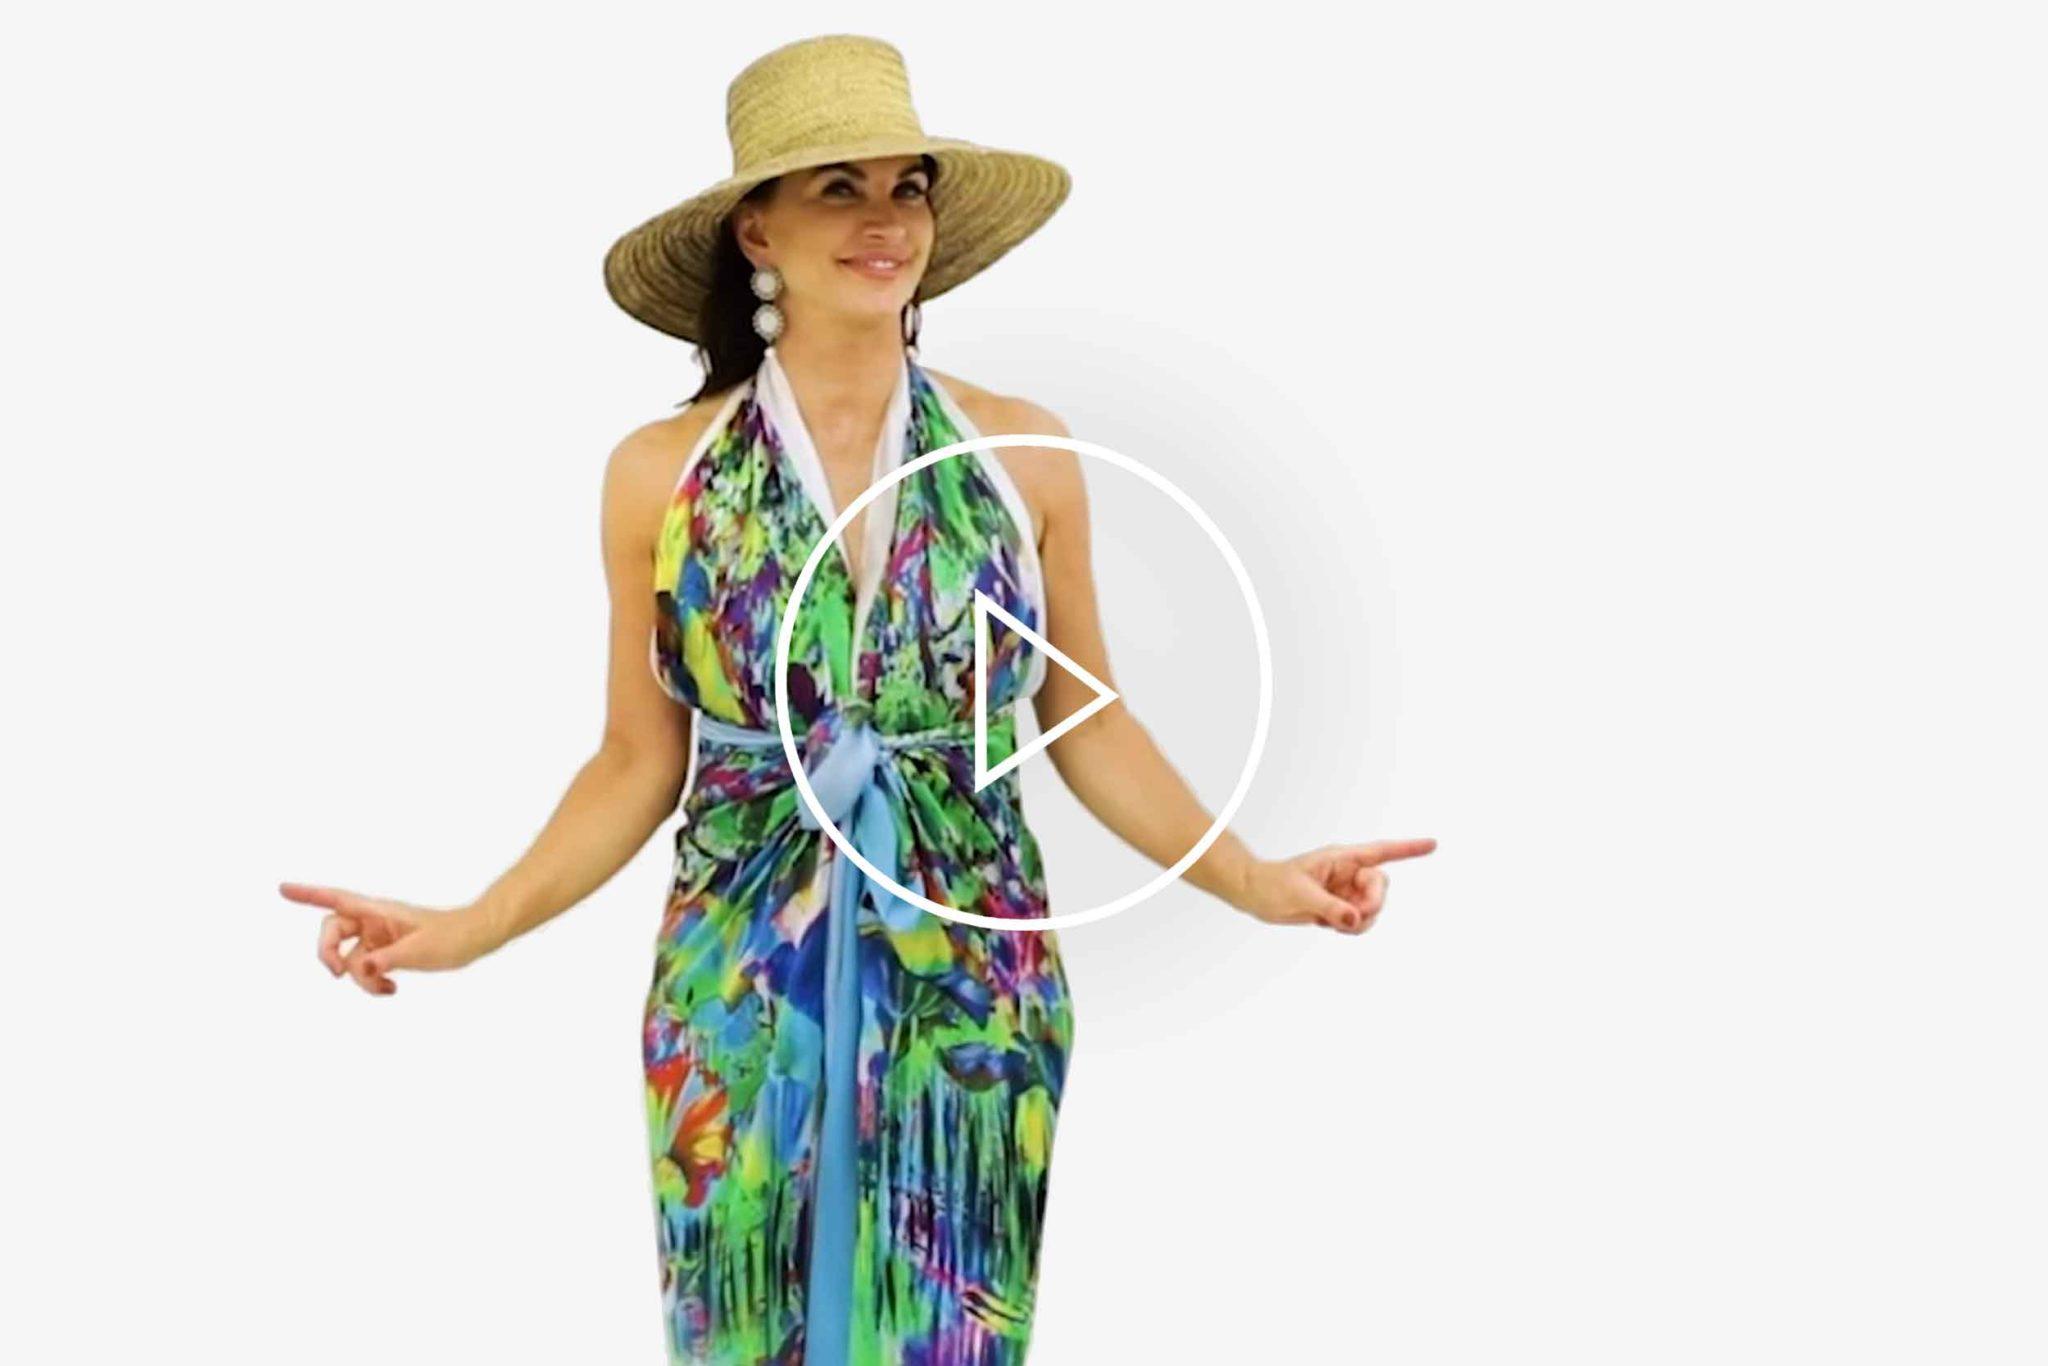 Cornelia Hagmann La Galleria Silk Scarves Styles Inspirations No 4 5 6, Seidenschal, sciarpa di seta, foulard soie,